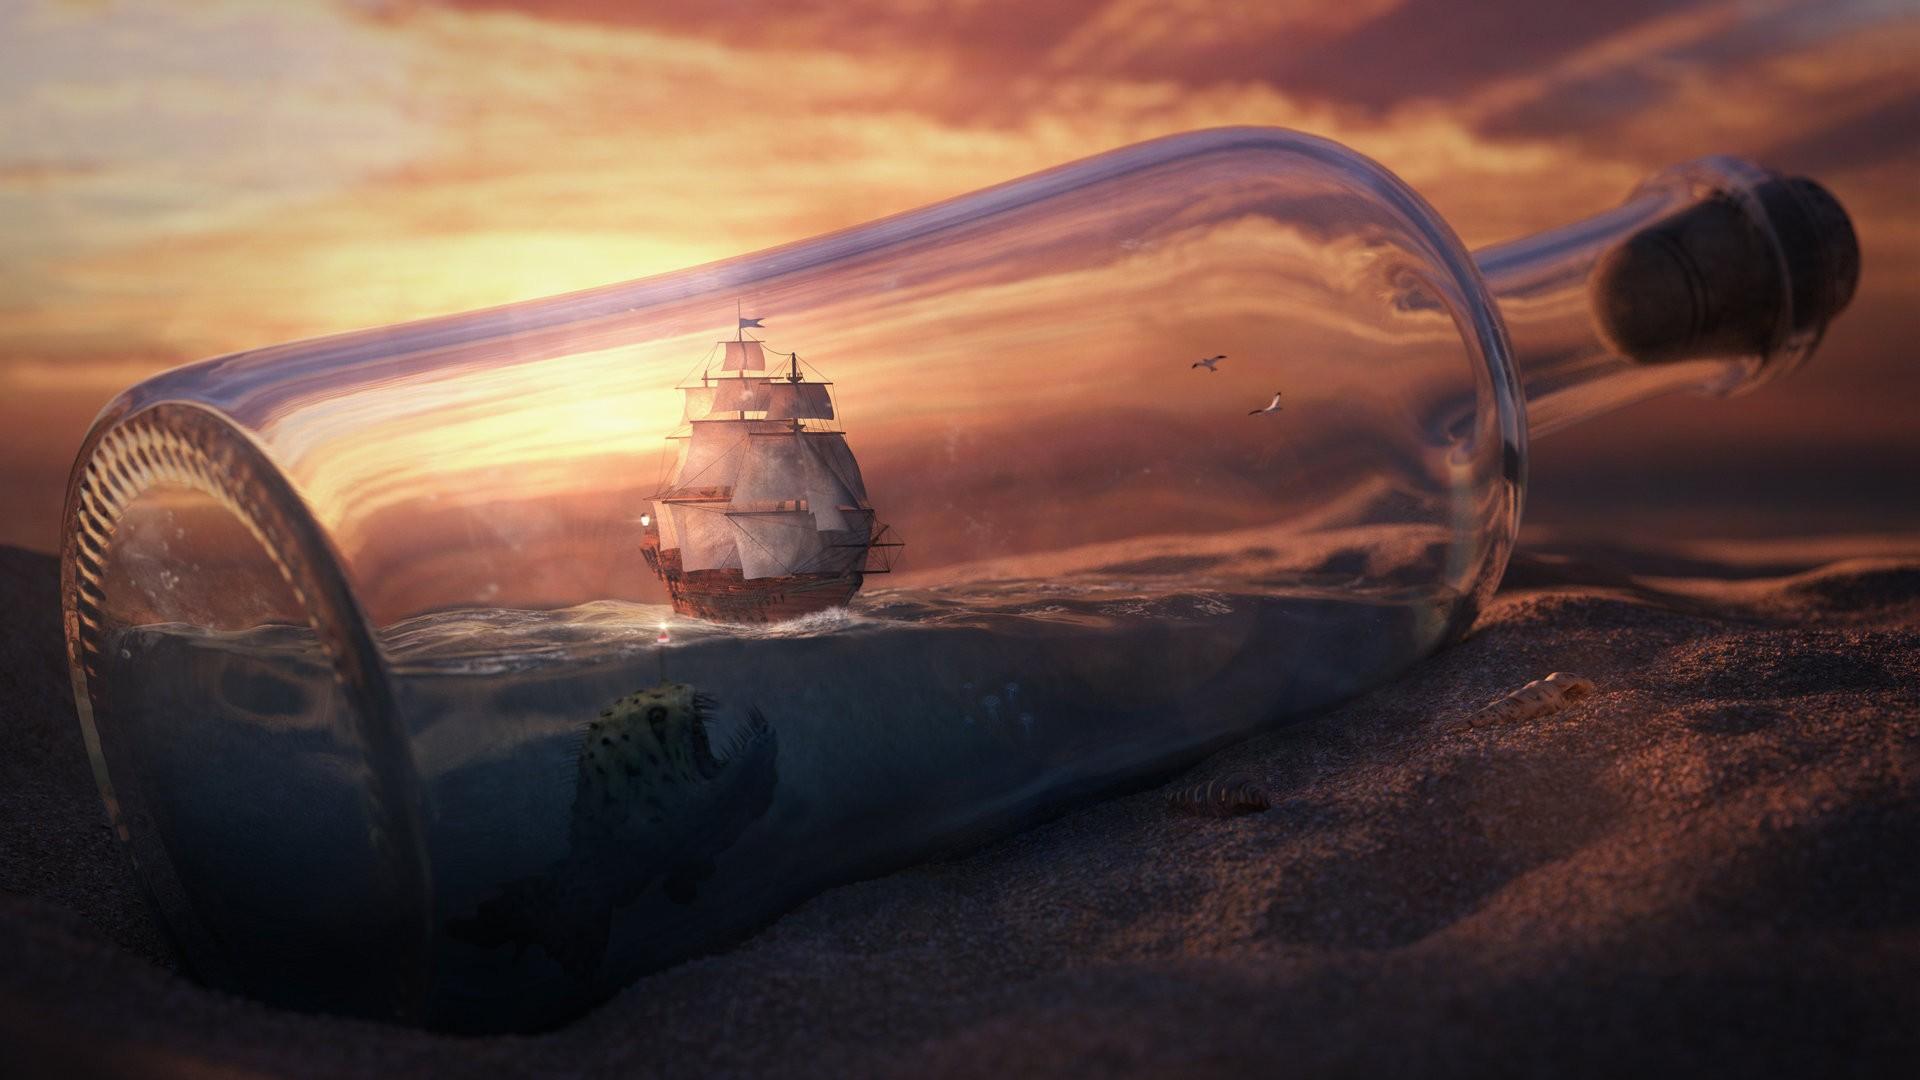 bottle ship wallpaper hd desktop - photo #13